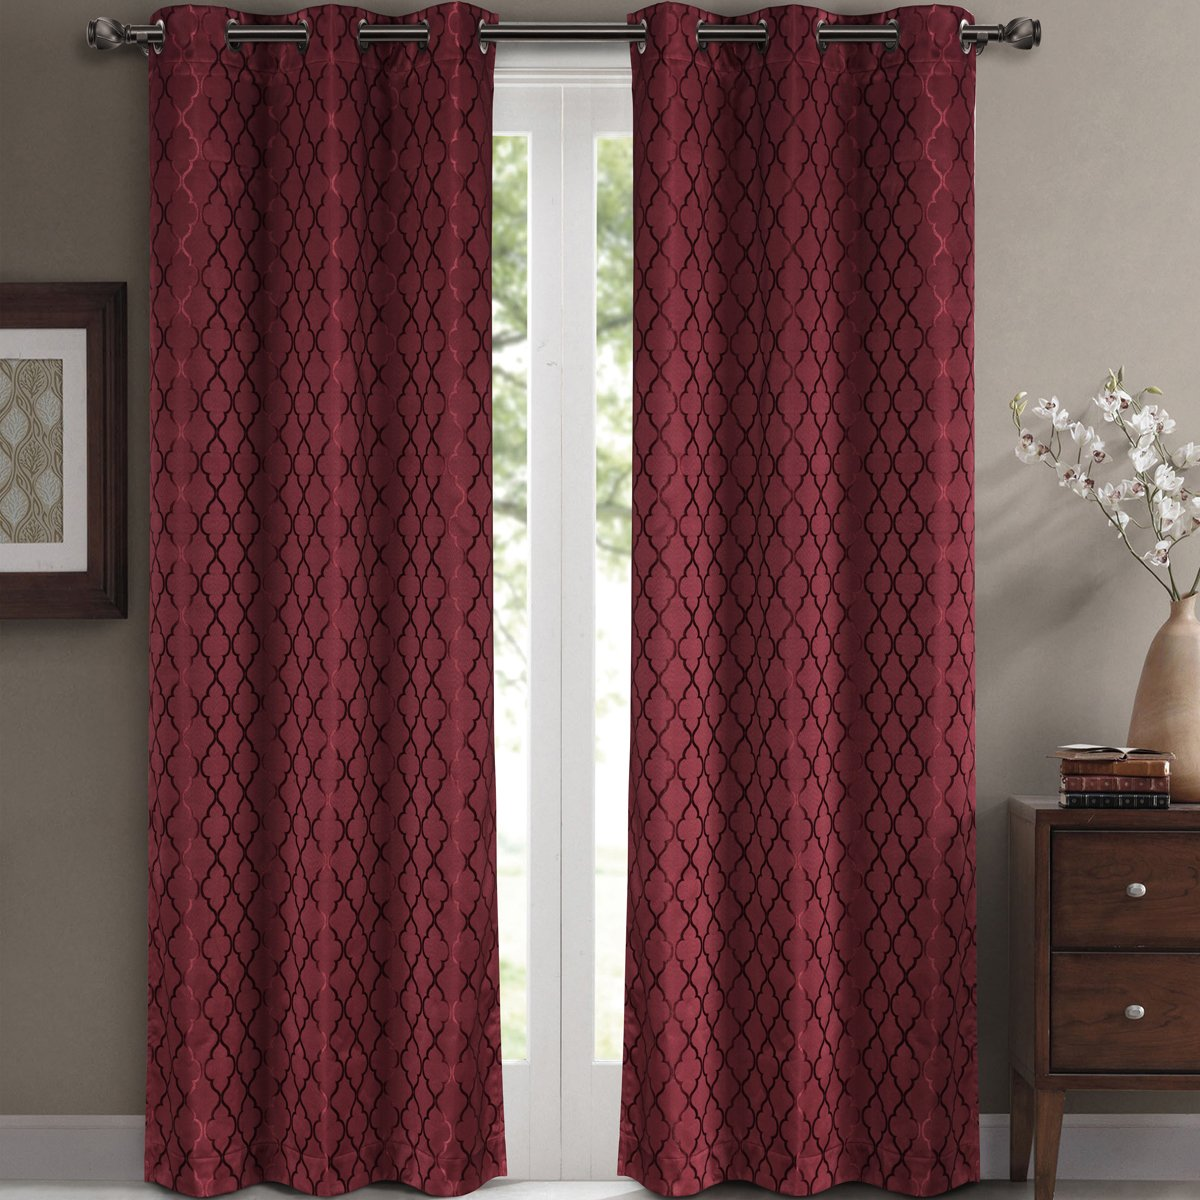 thermal panels ebay black curtain curtains photo blackout barn door burgundy beautiful of sliding att patio x insulated